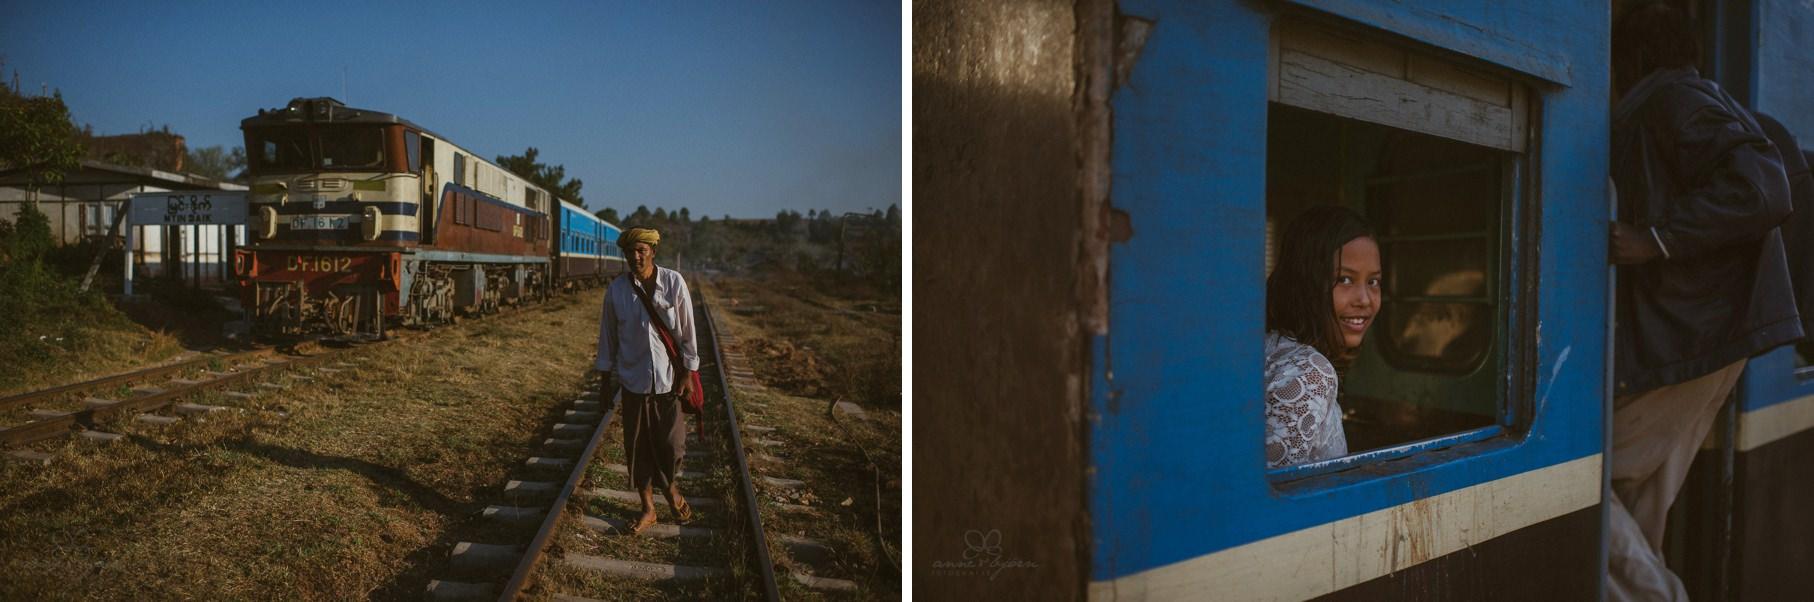 0072 yangon mandalay d76 5329 - Großstädte Myanmars - Yangon & Mandalay